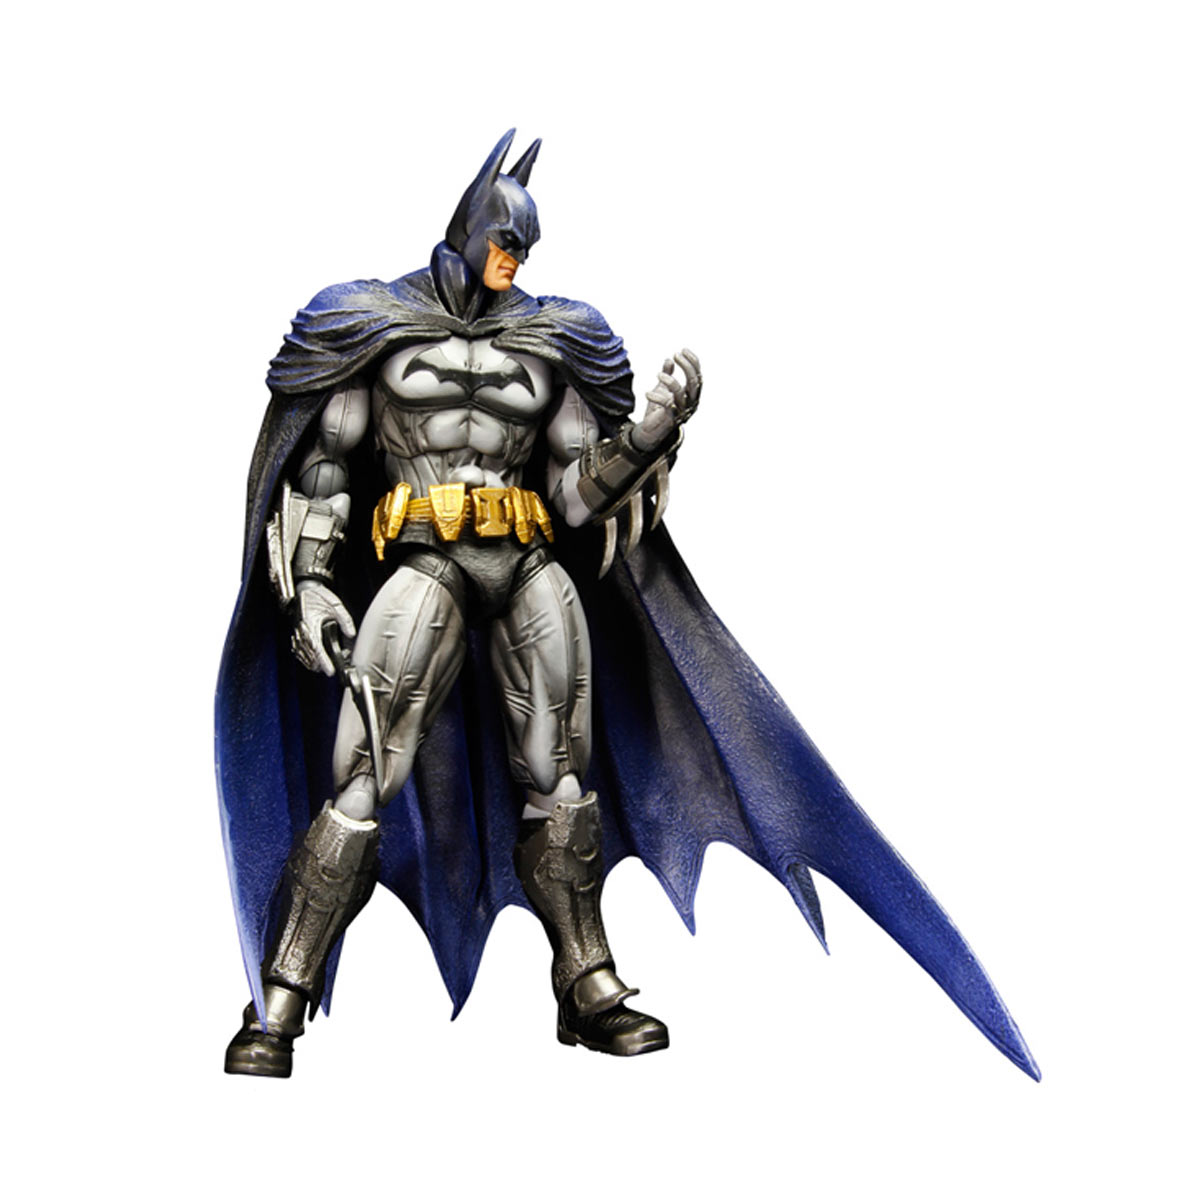 Boneco (Action Figure) Batman Arkham City Play Arts Kai